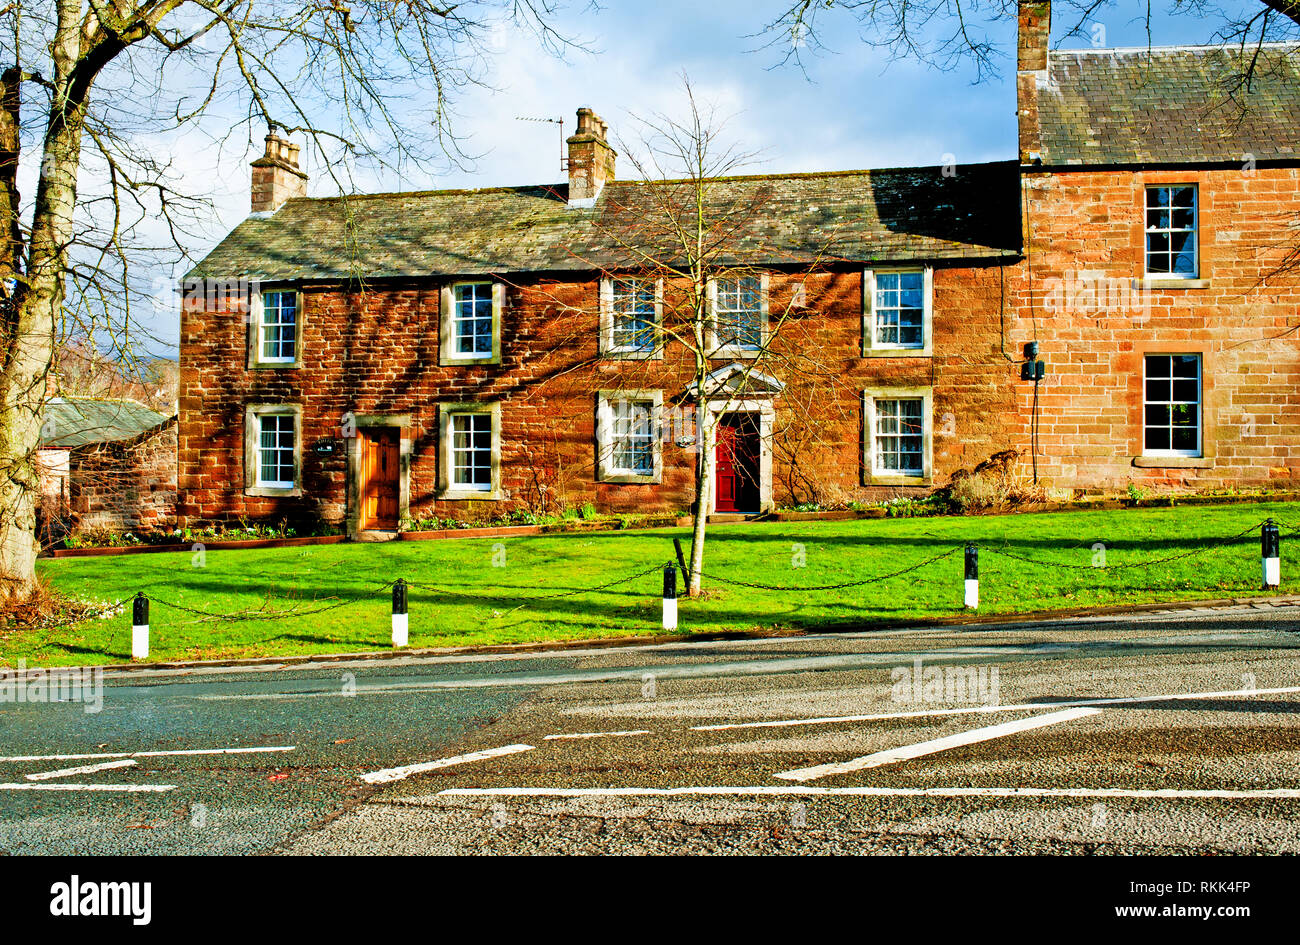 Cottages, Boroughgate, Appleby in Westmorland, Cumbria, England - Stock Image